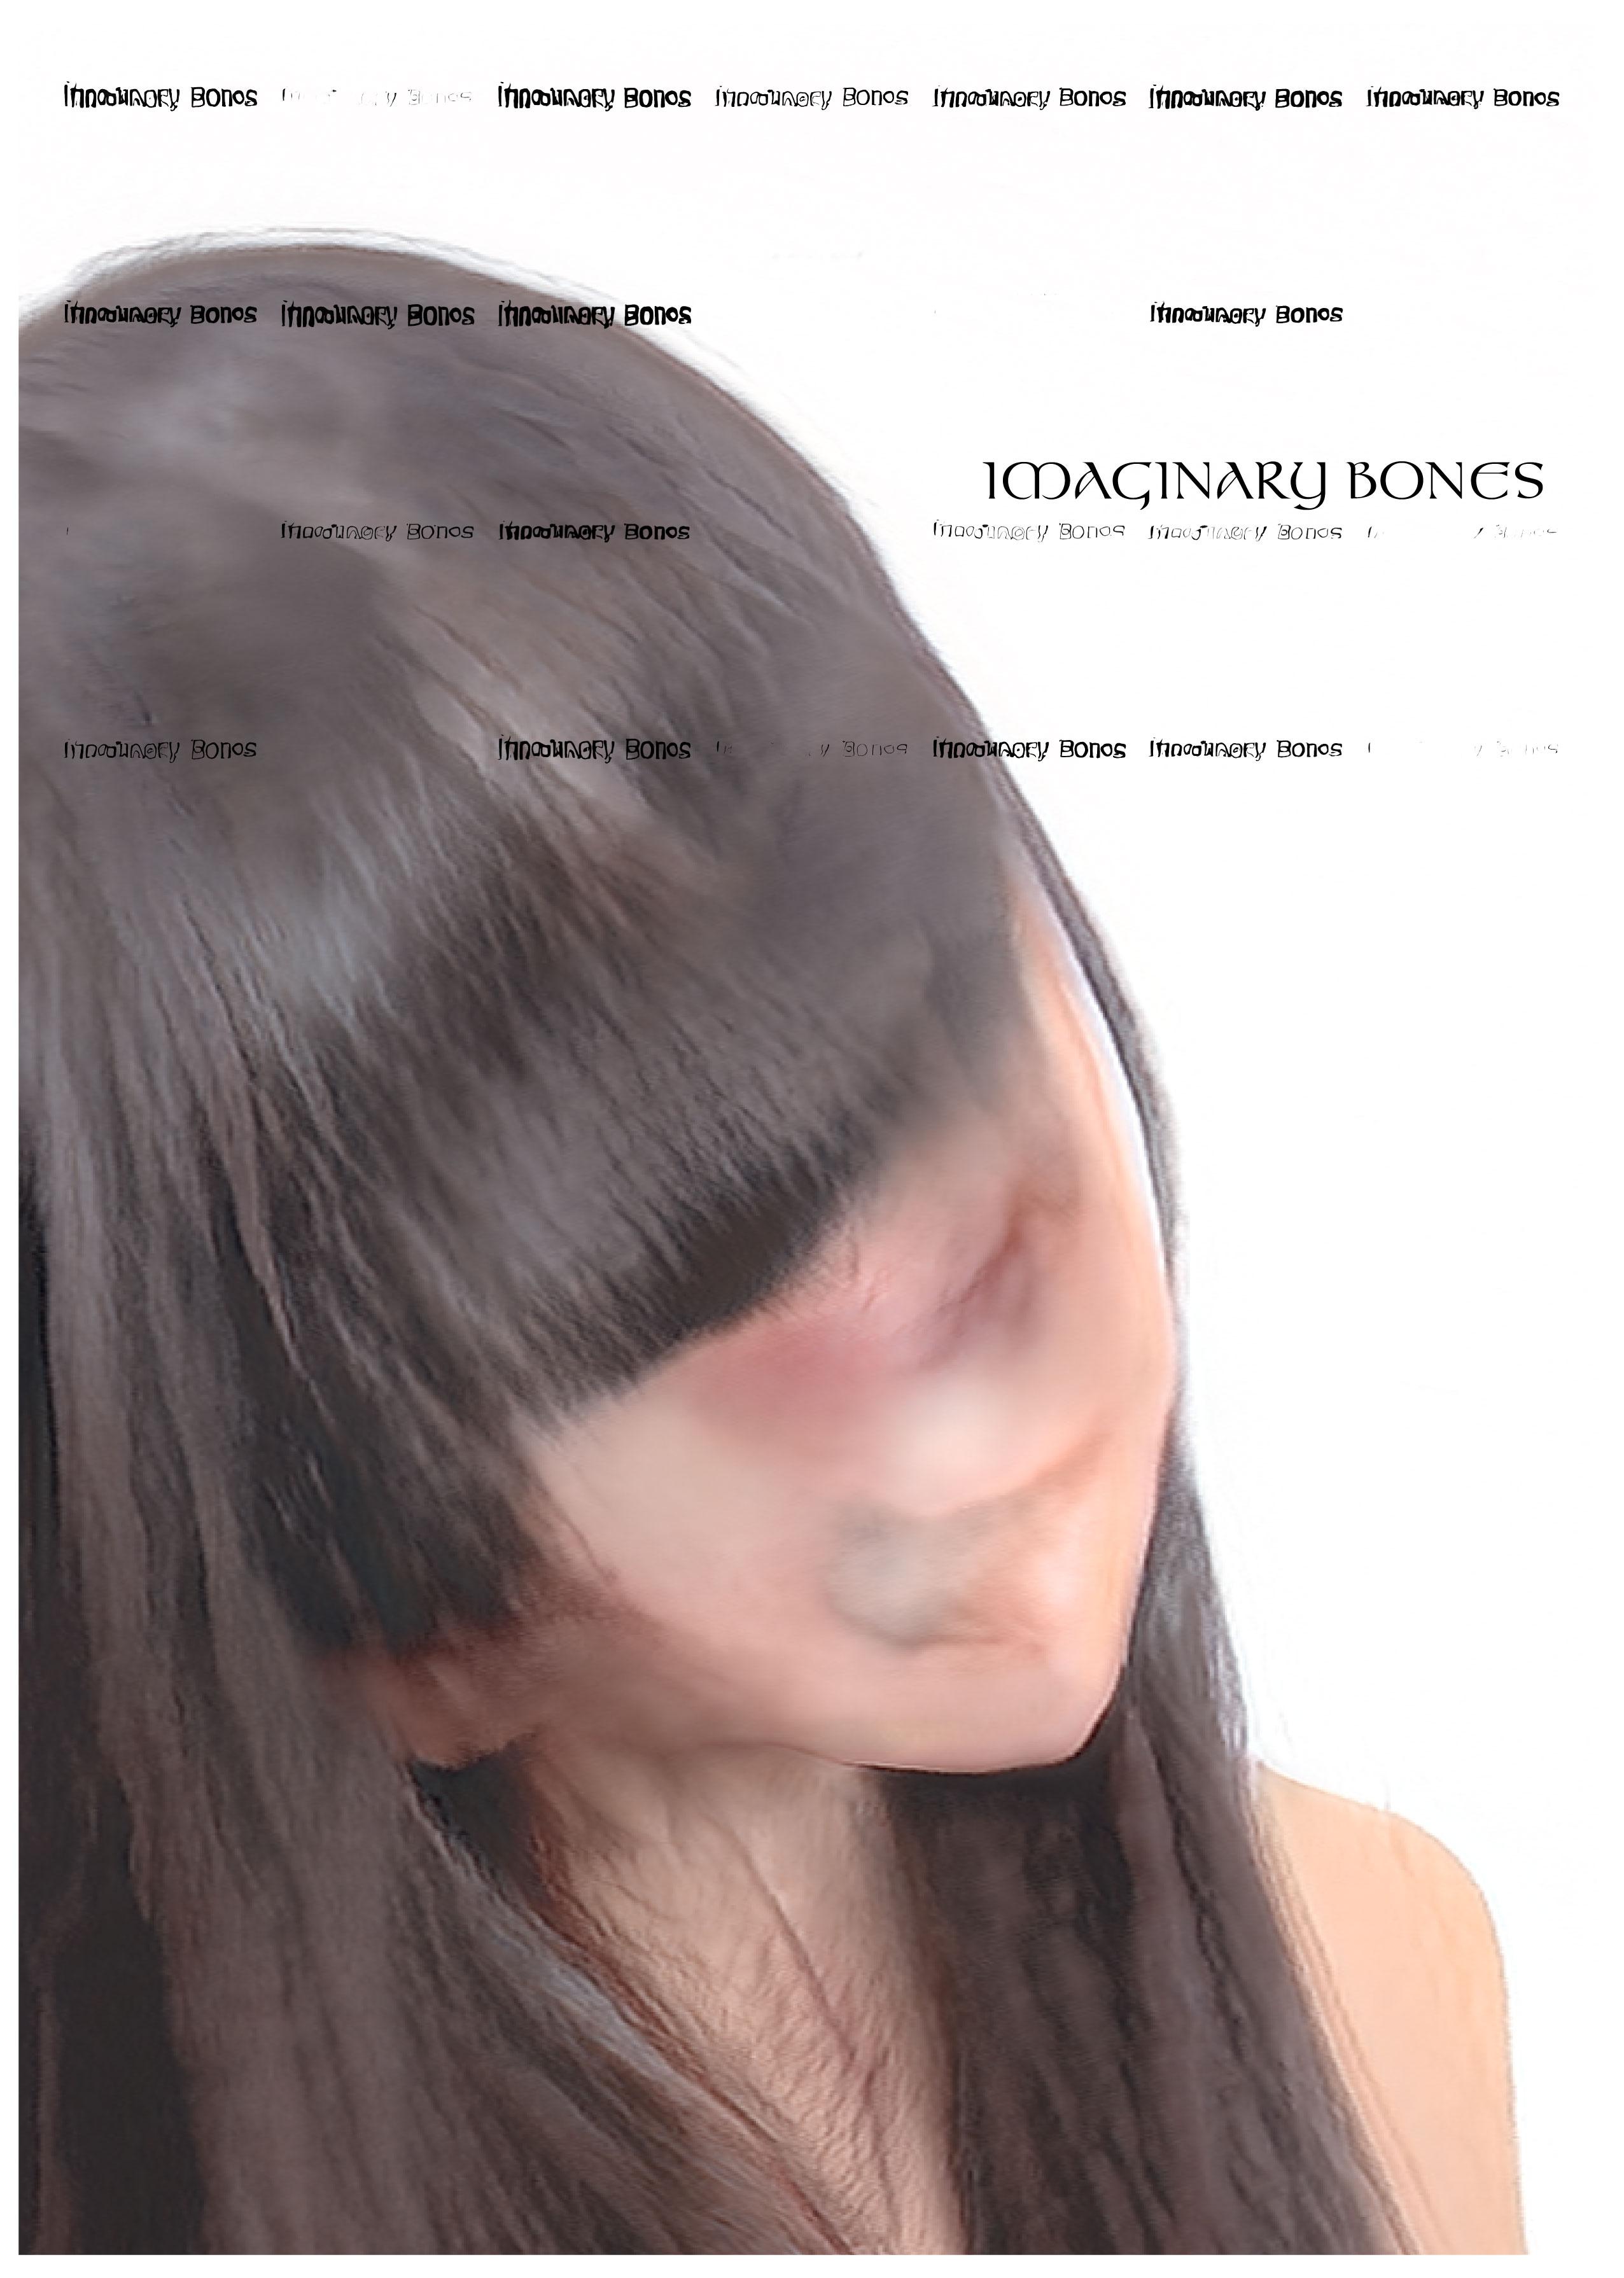 "【Limited Edition with NFT art】Yuma Kishi ""Imaginary Bones"" Release on Feb 28th 2022"